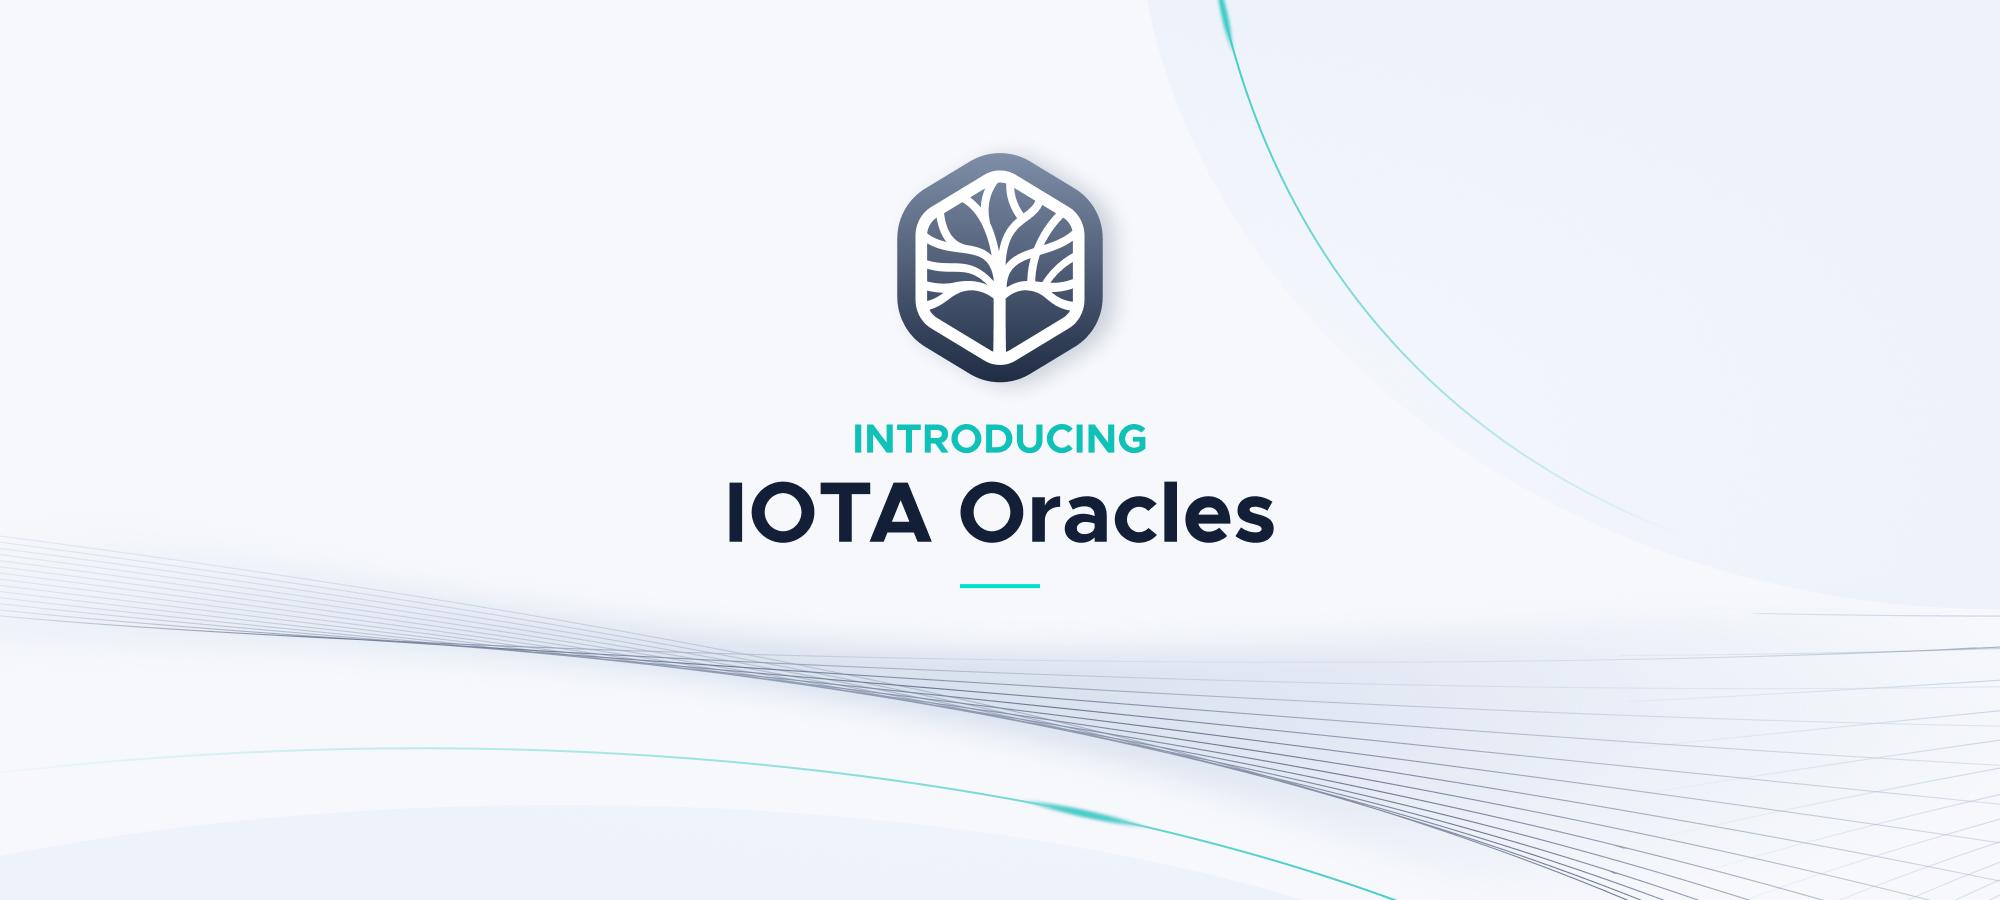 Introducing IOTA Oracles